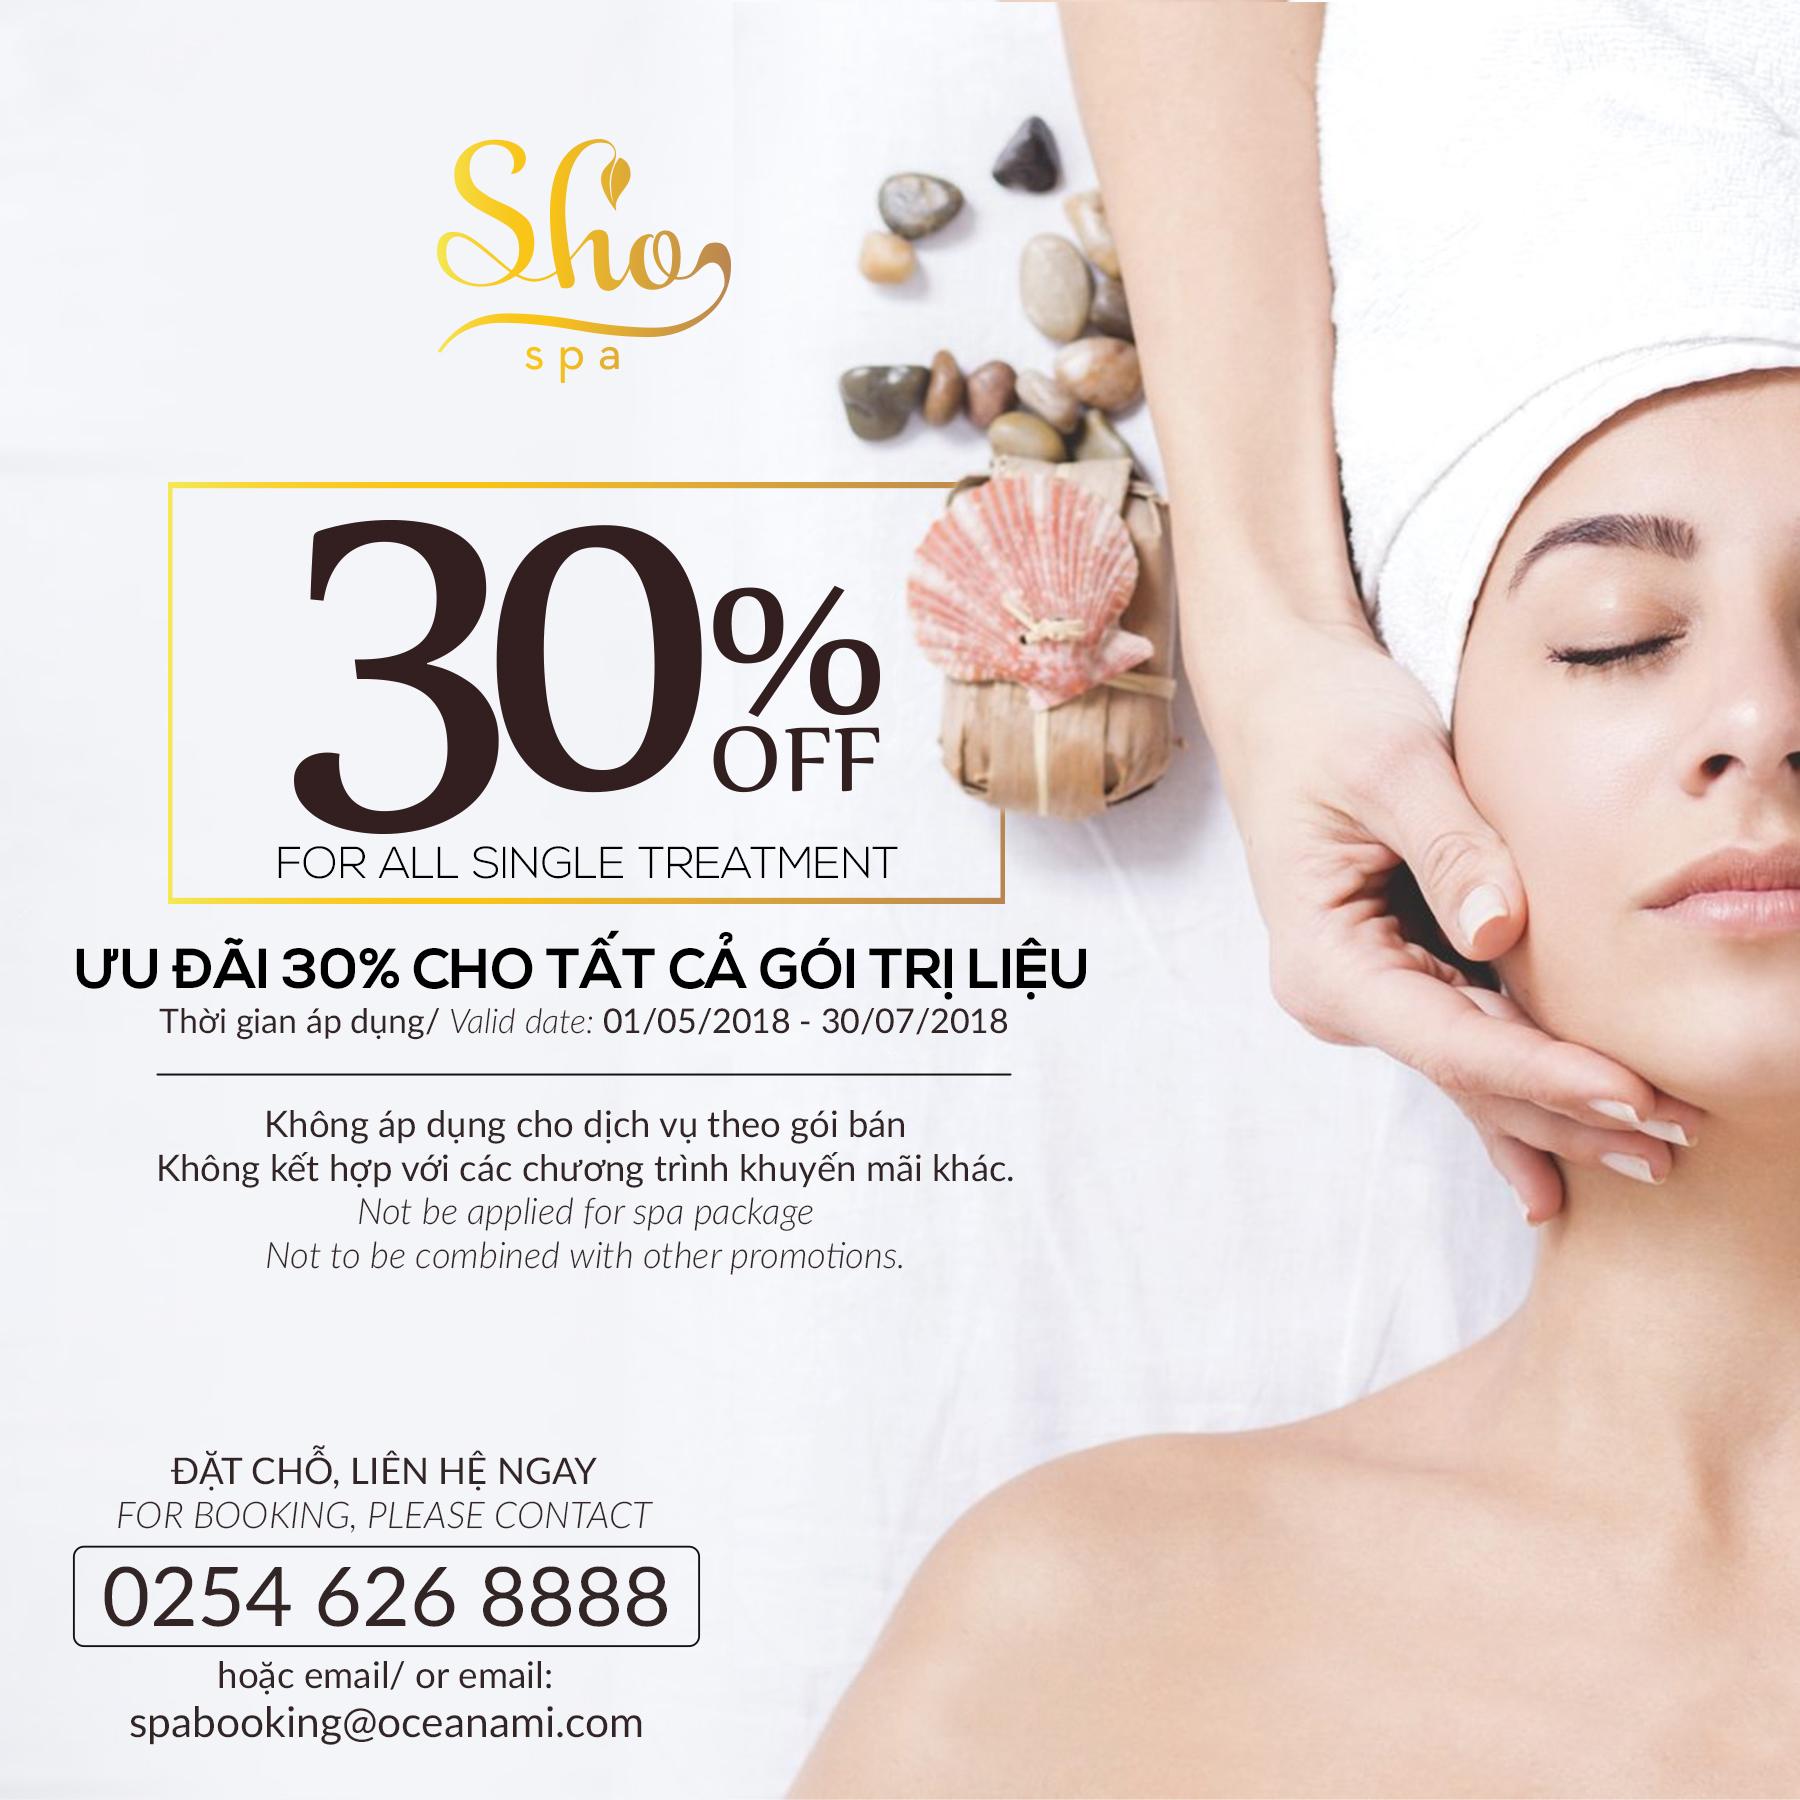 spa30off-1500x1500